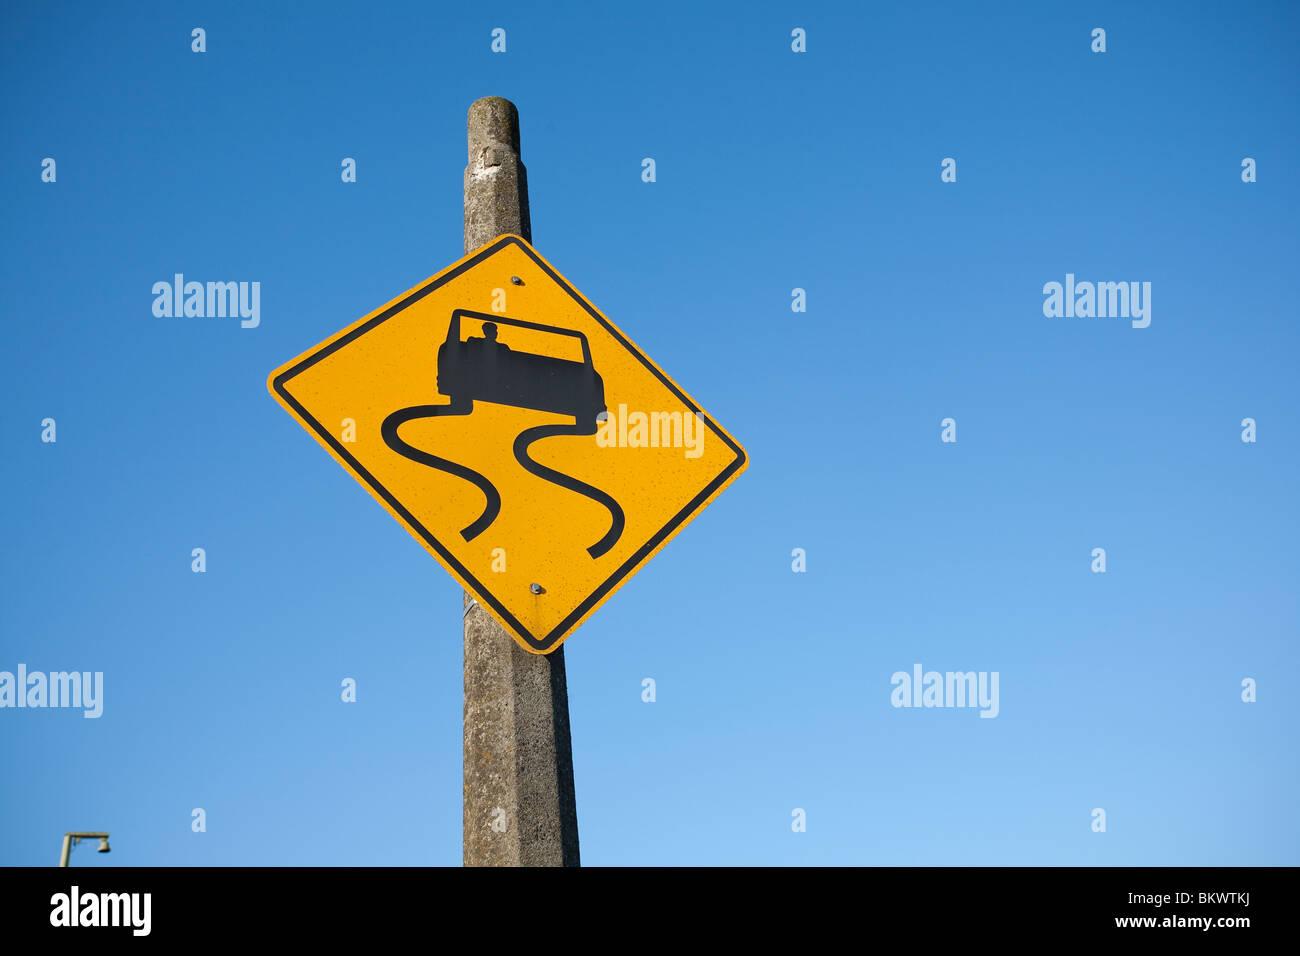 Slippery When Wet Traffic Warning Sign - South Park - Seattle, Washington - Stock Image